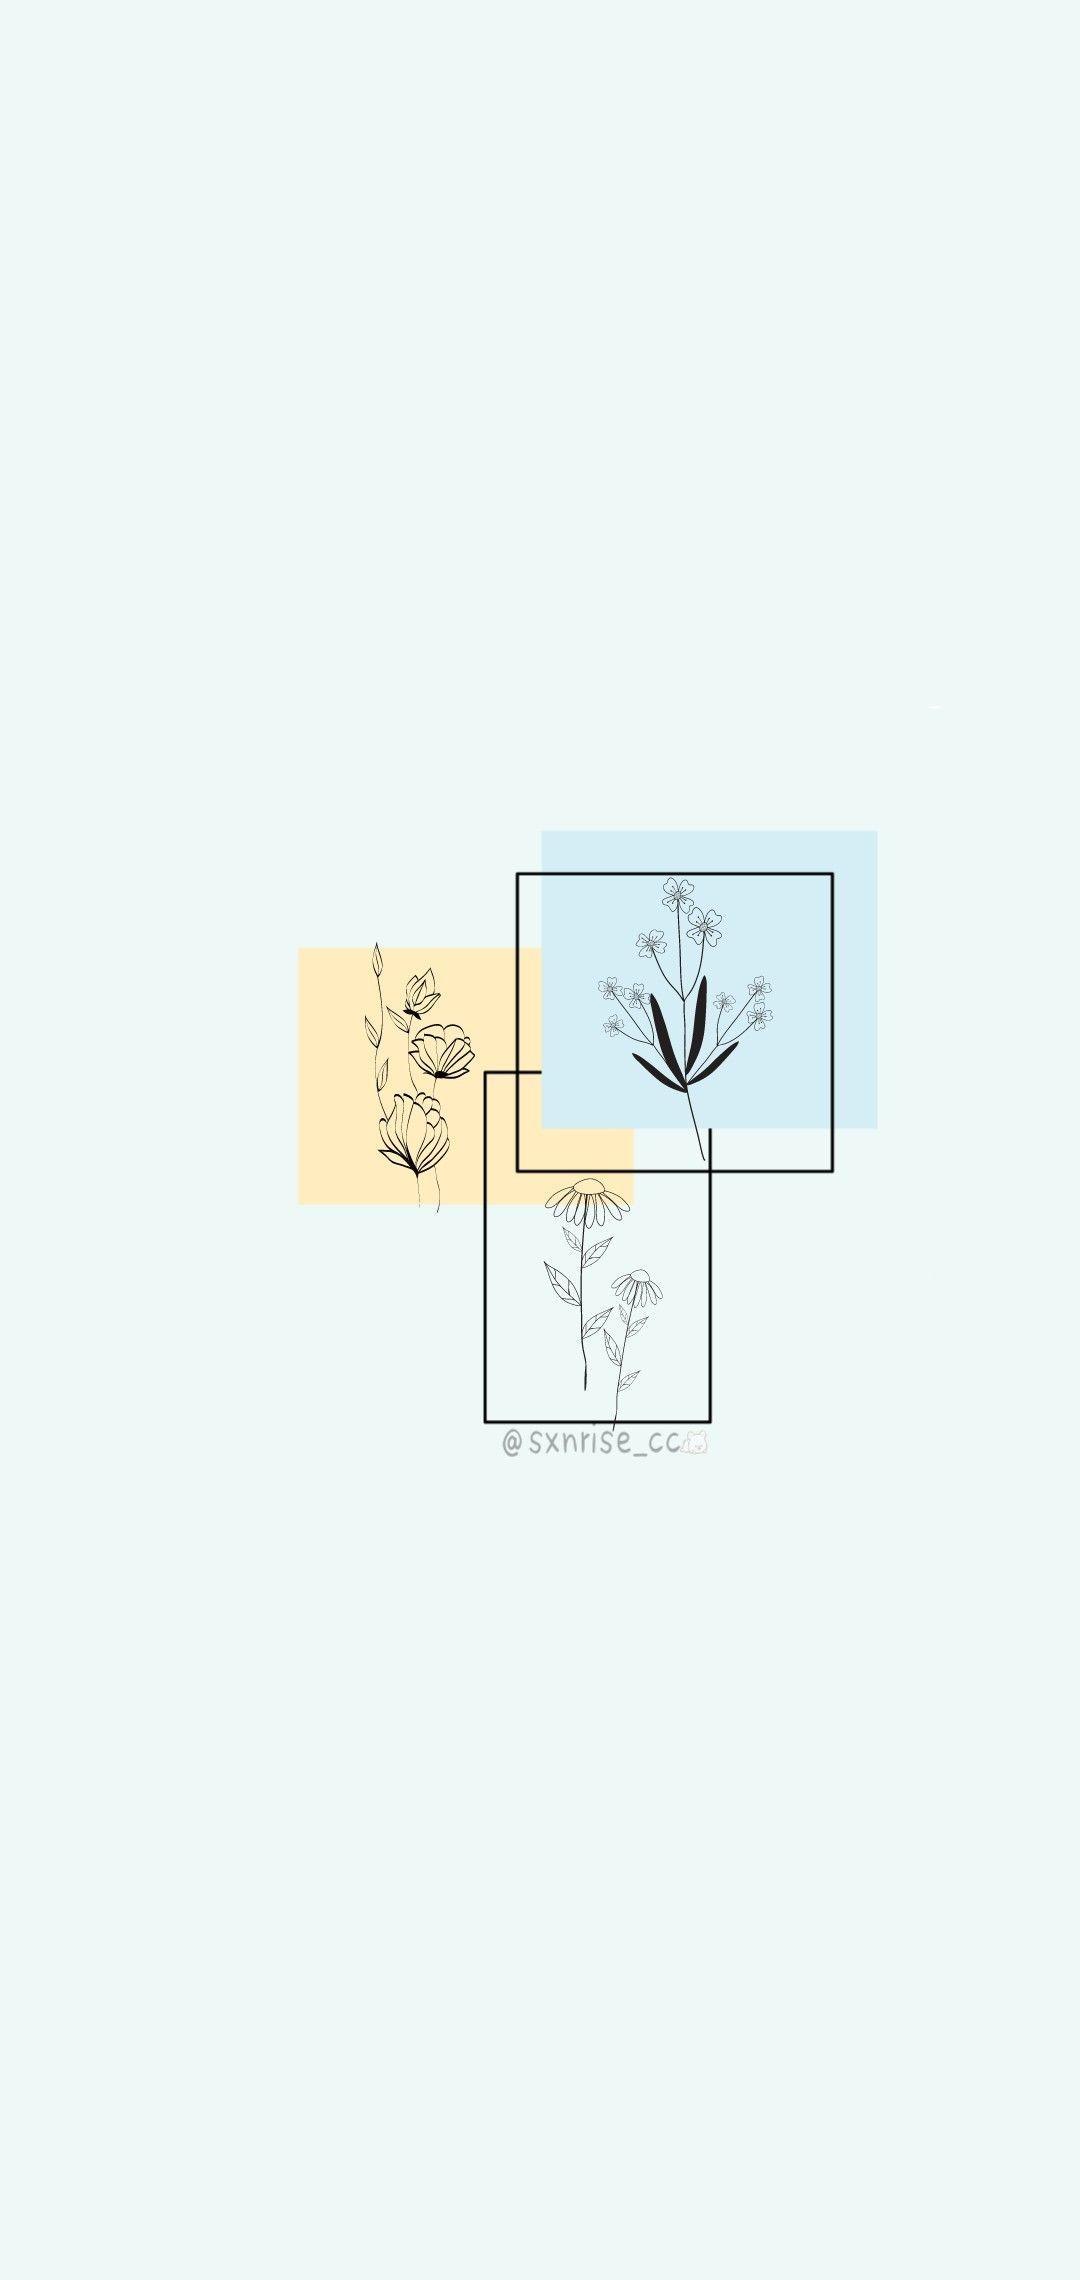 Minimalista In 2020 Minimalist Wallpaper Simple Wallpapers Aesthetic Iphone Wallpaper